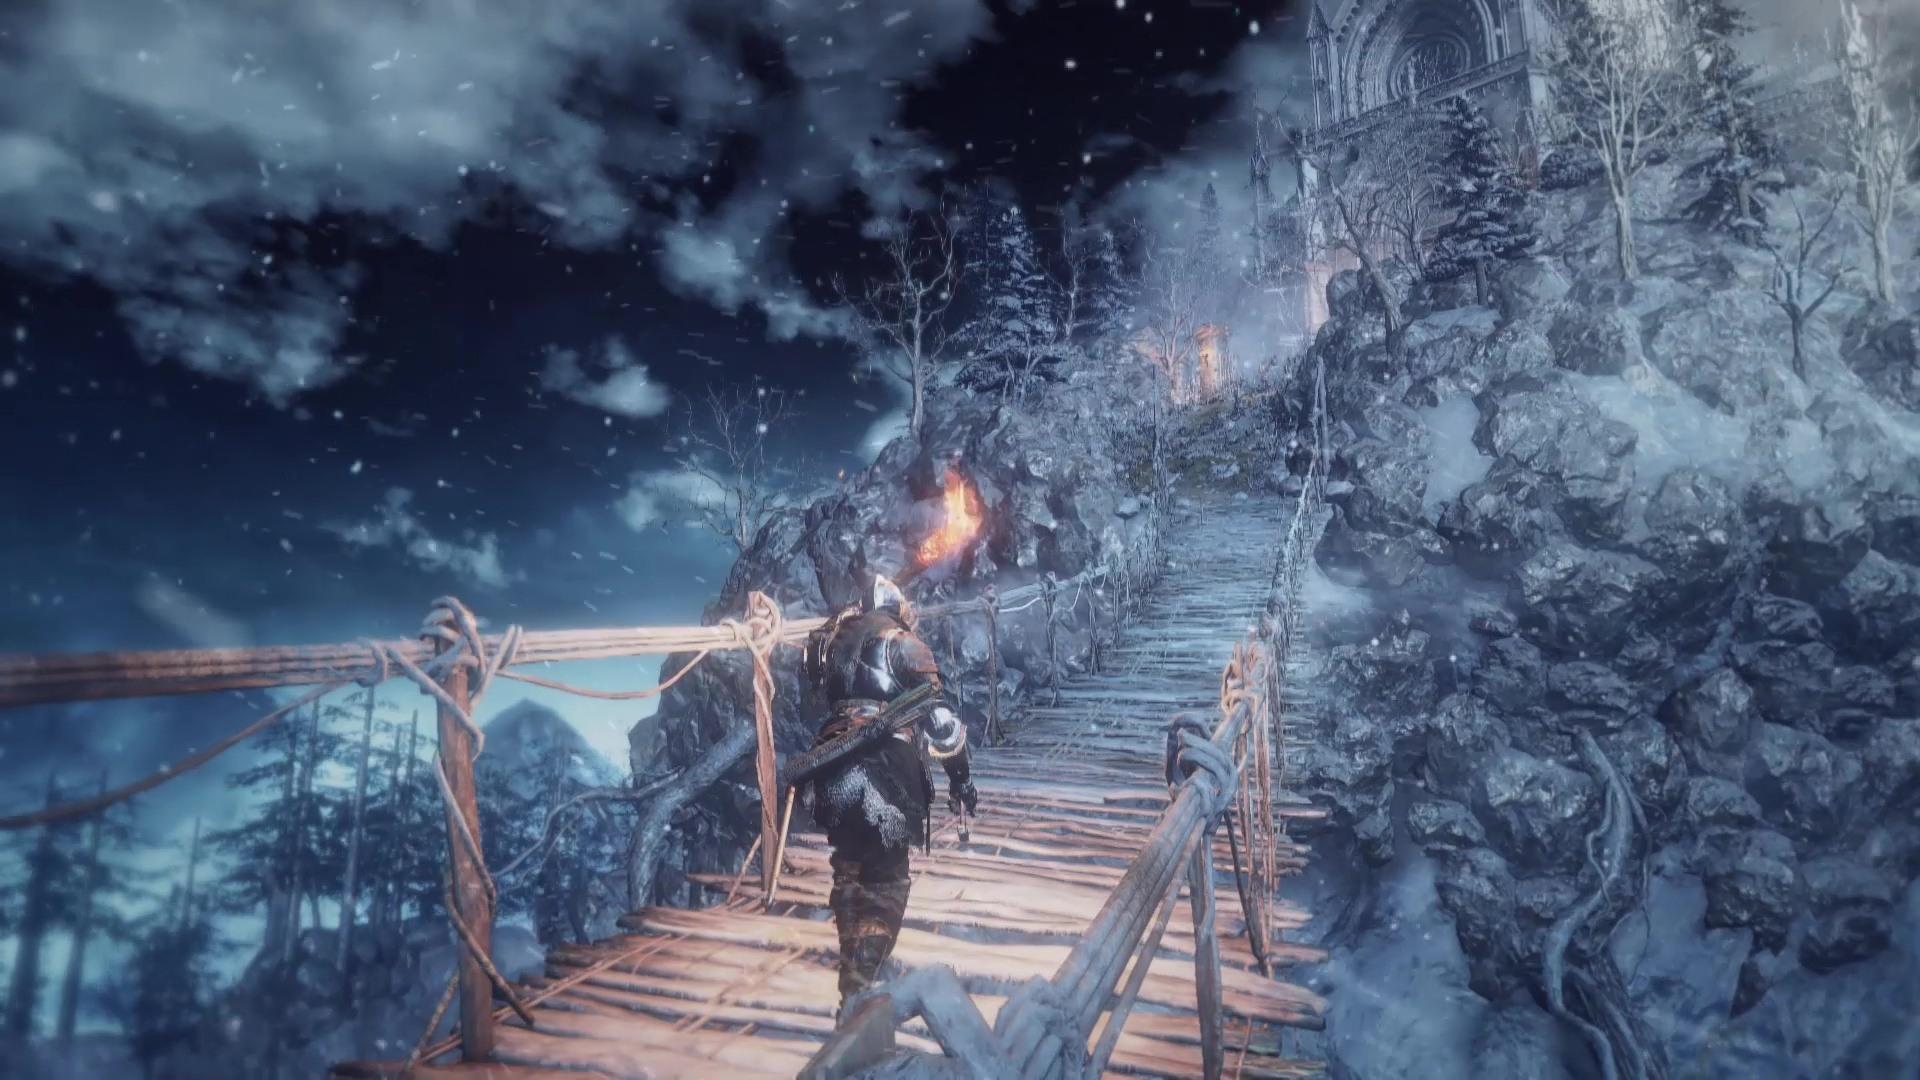 dark-souls-3-ashes-of-ariandel-trailer-breakdown_njxn.jpg